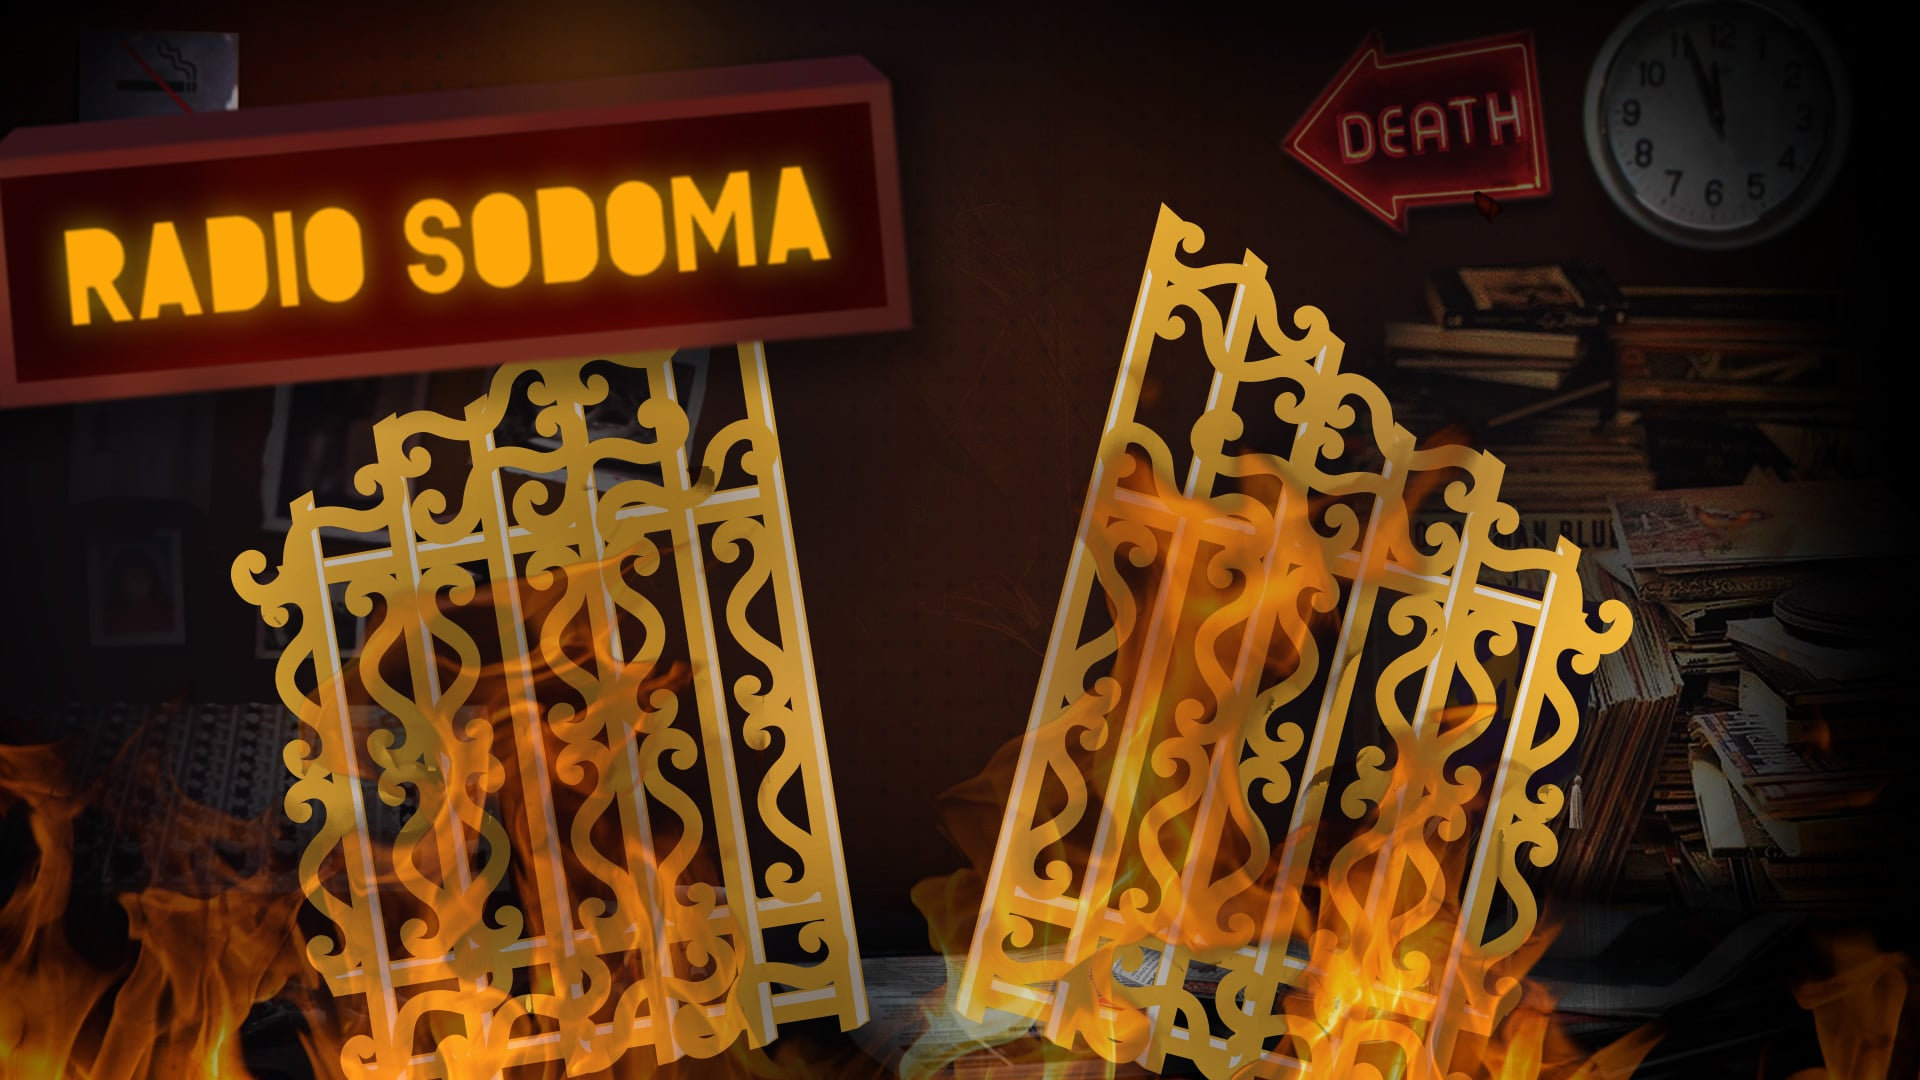 Radio Sodoma